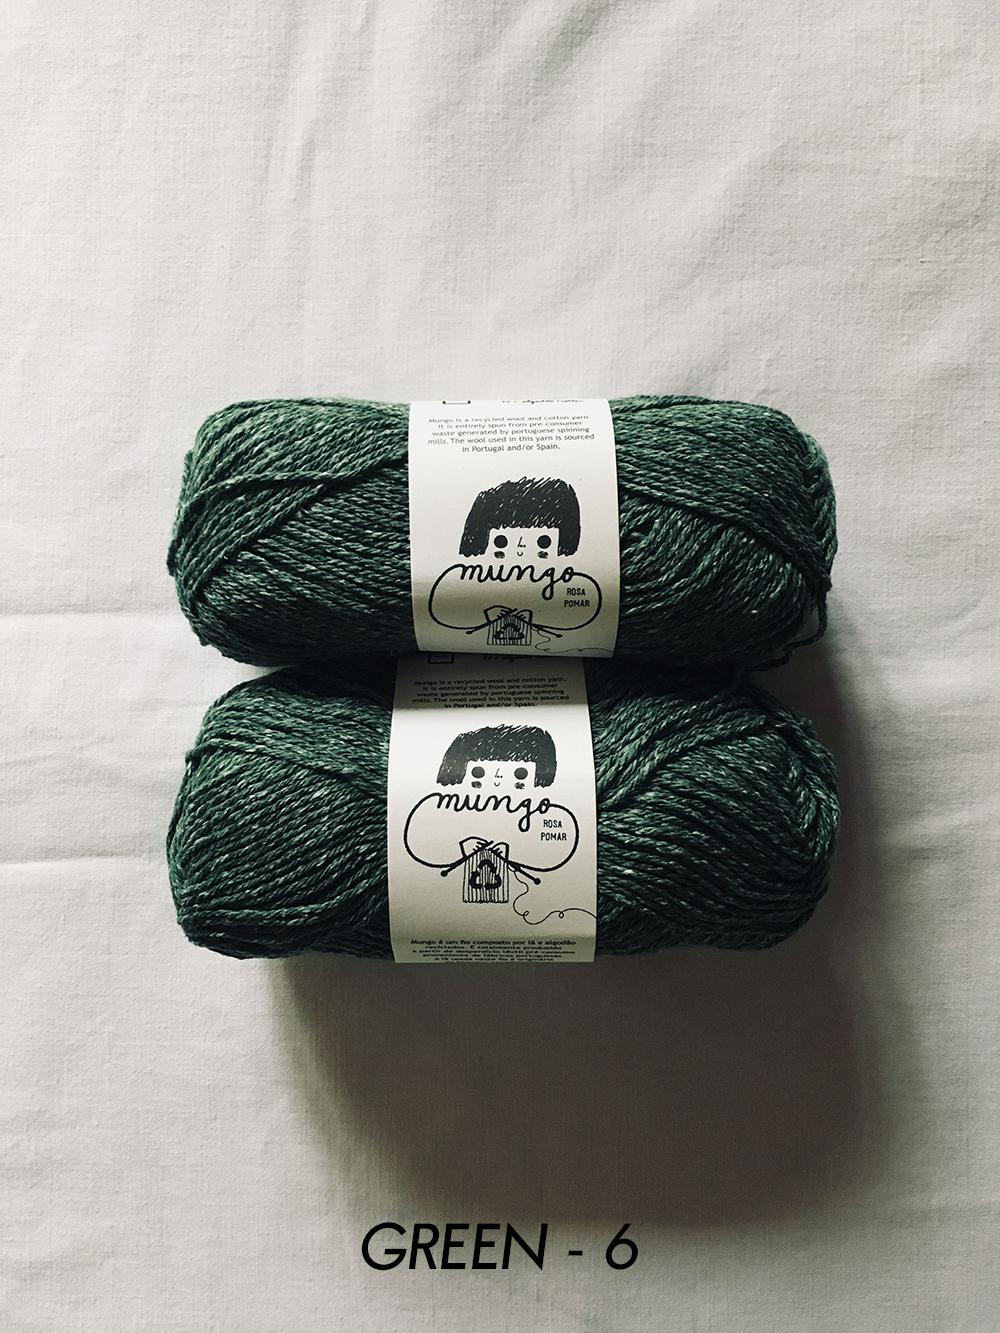 retrosaria_mungo_6_wool_done_knitting.jpg